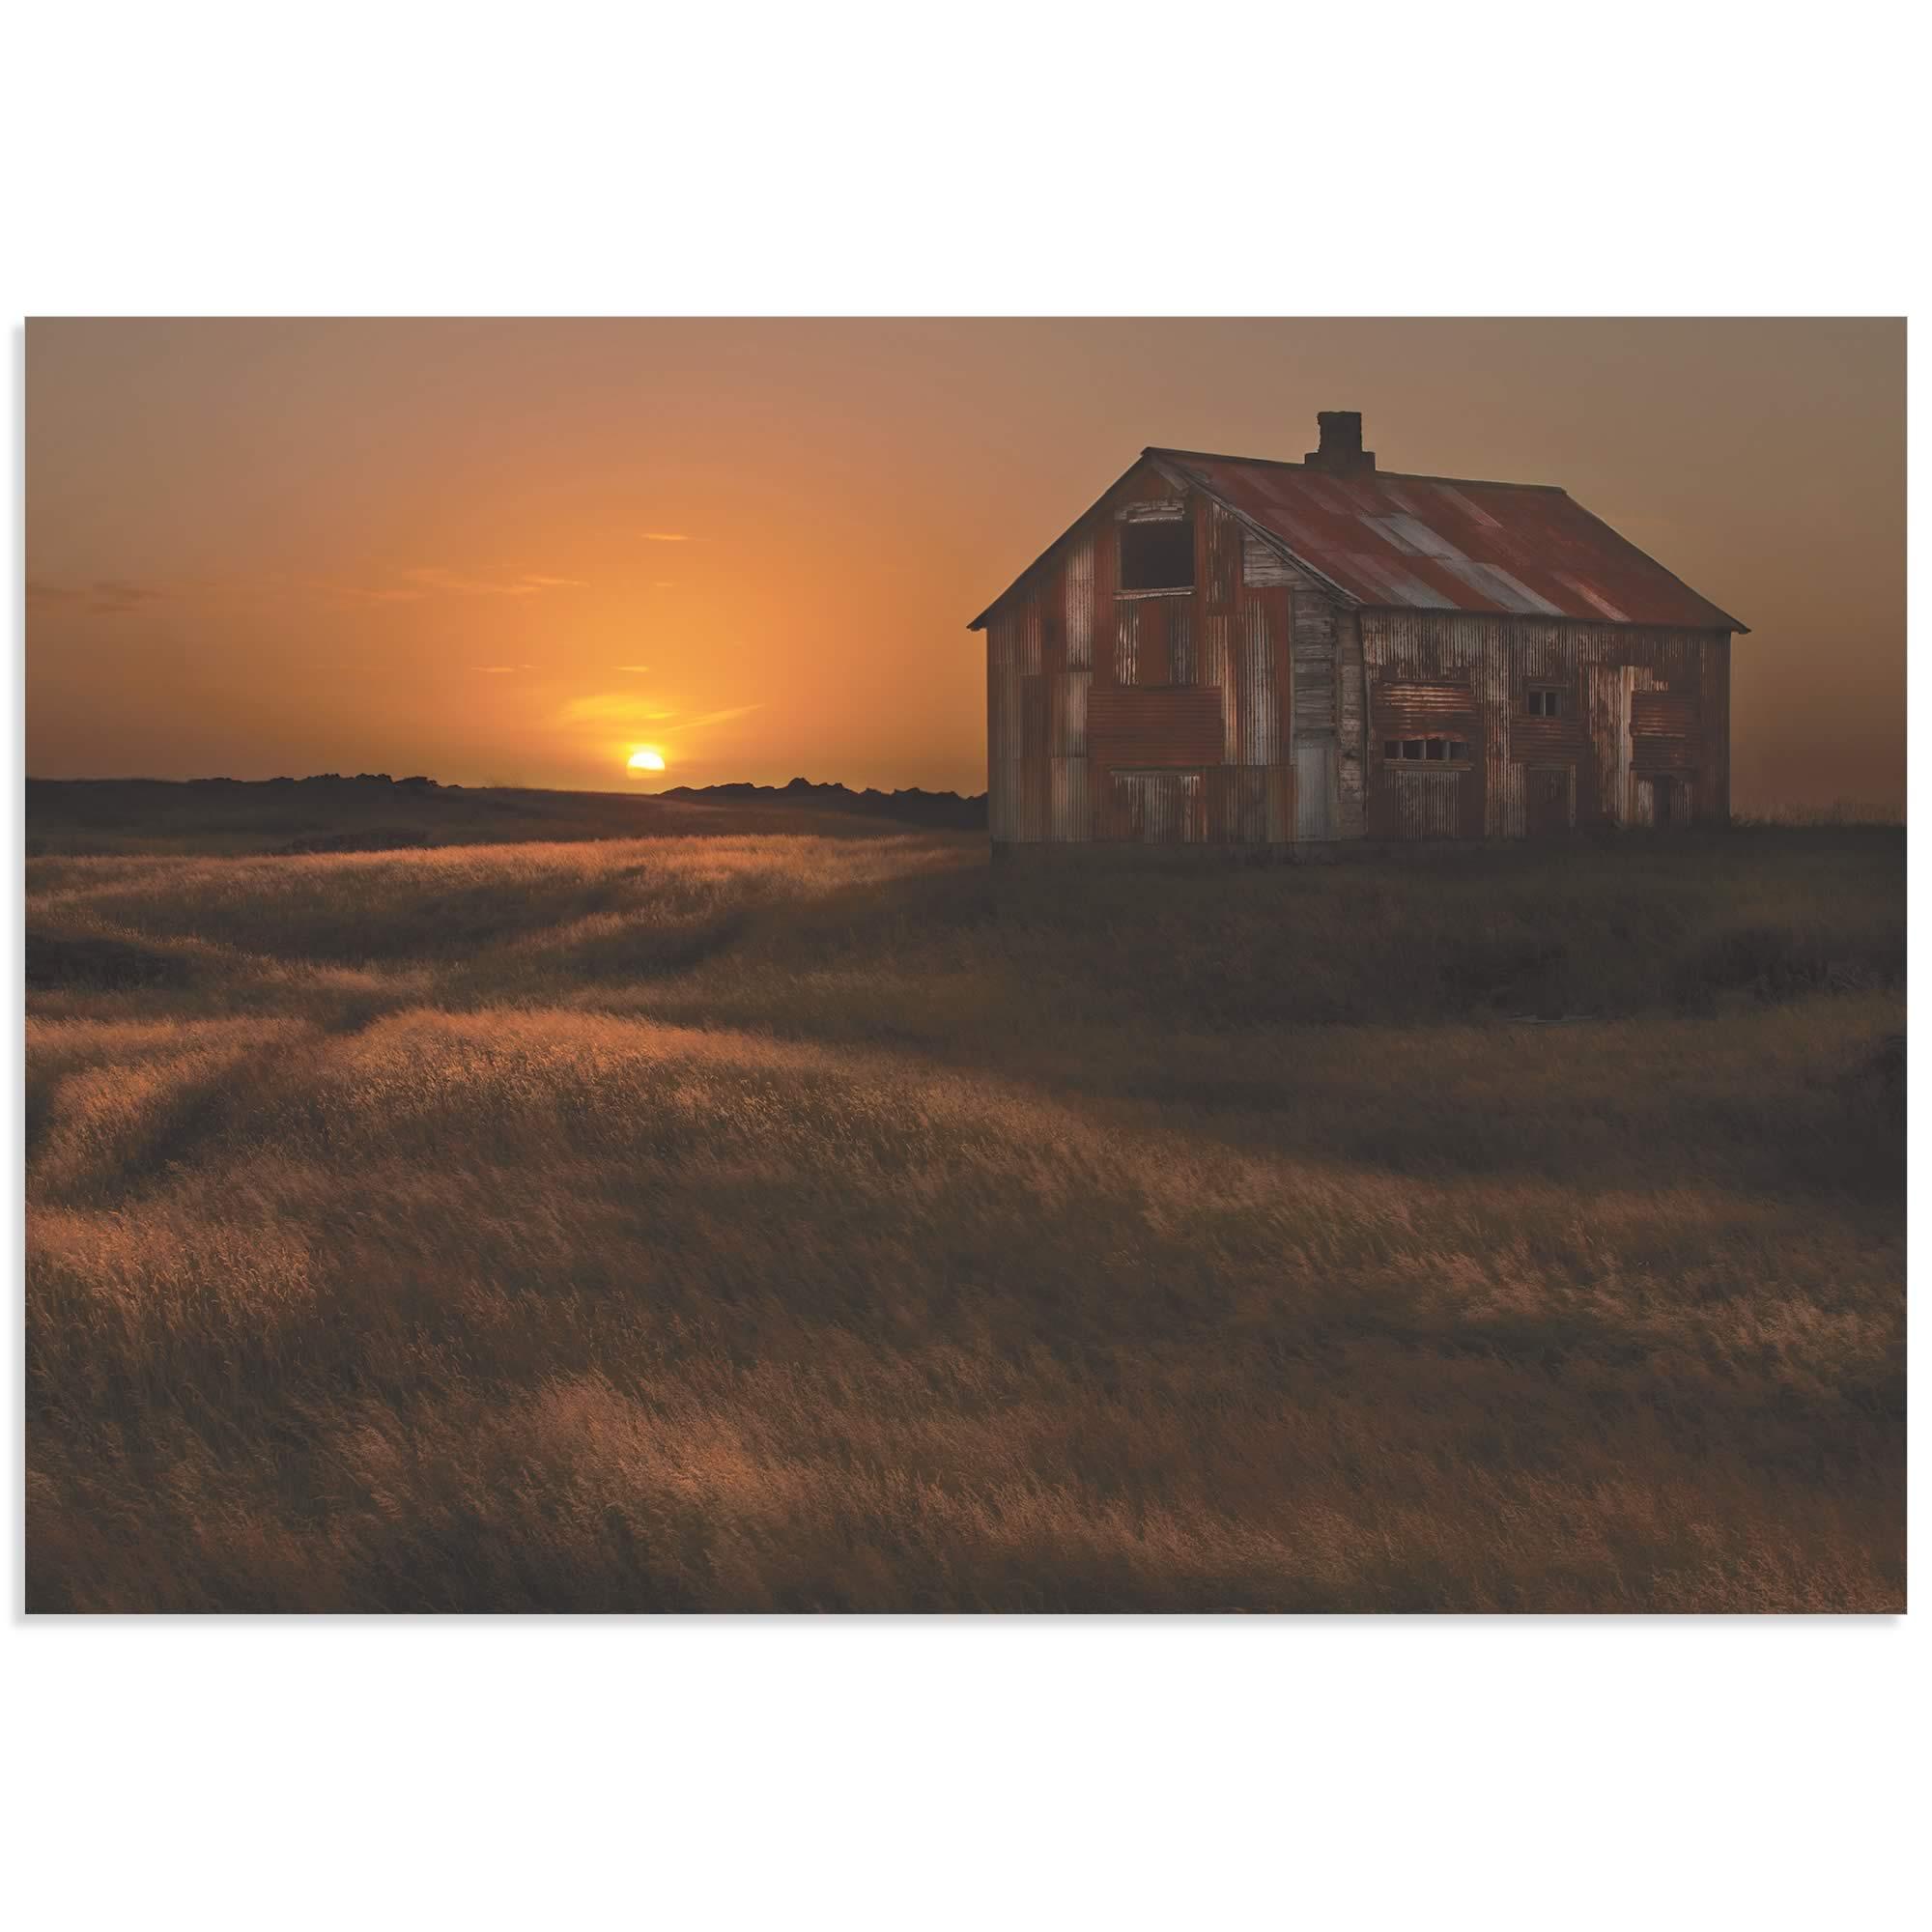 September Barn by Bragi Ingibergsson - Rustic Decor on Metal or Acrylic